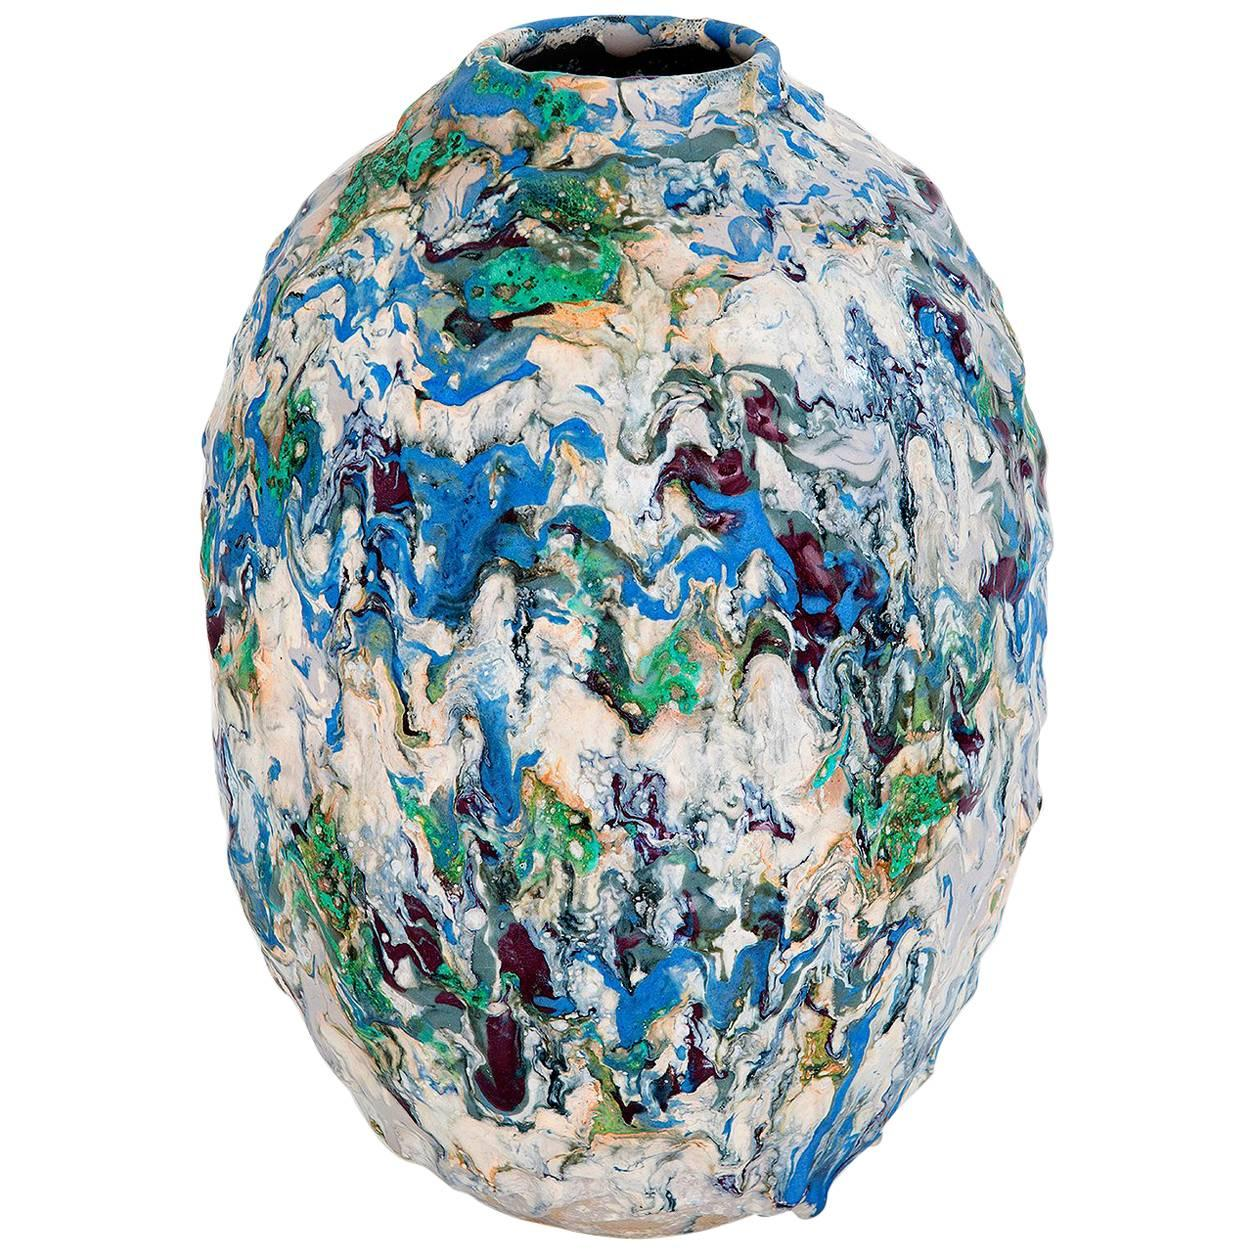 Contemporary Colourful Ceramic Vase by Morten Løbner Espenser, Copenhagen, 2016